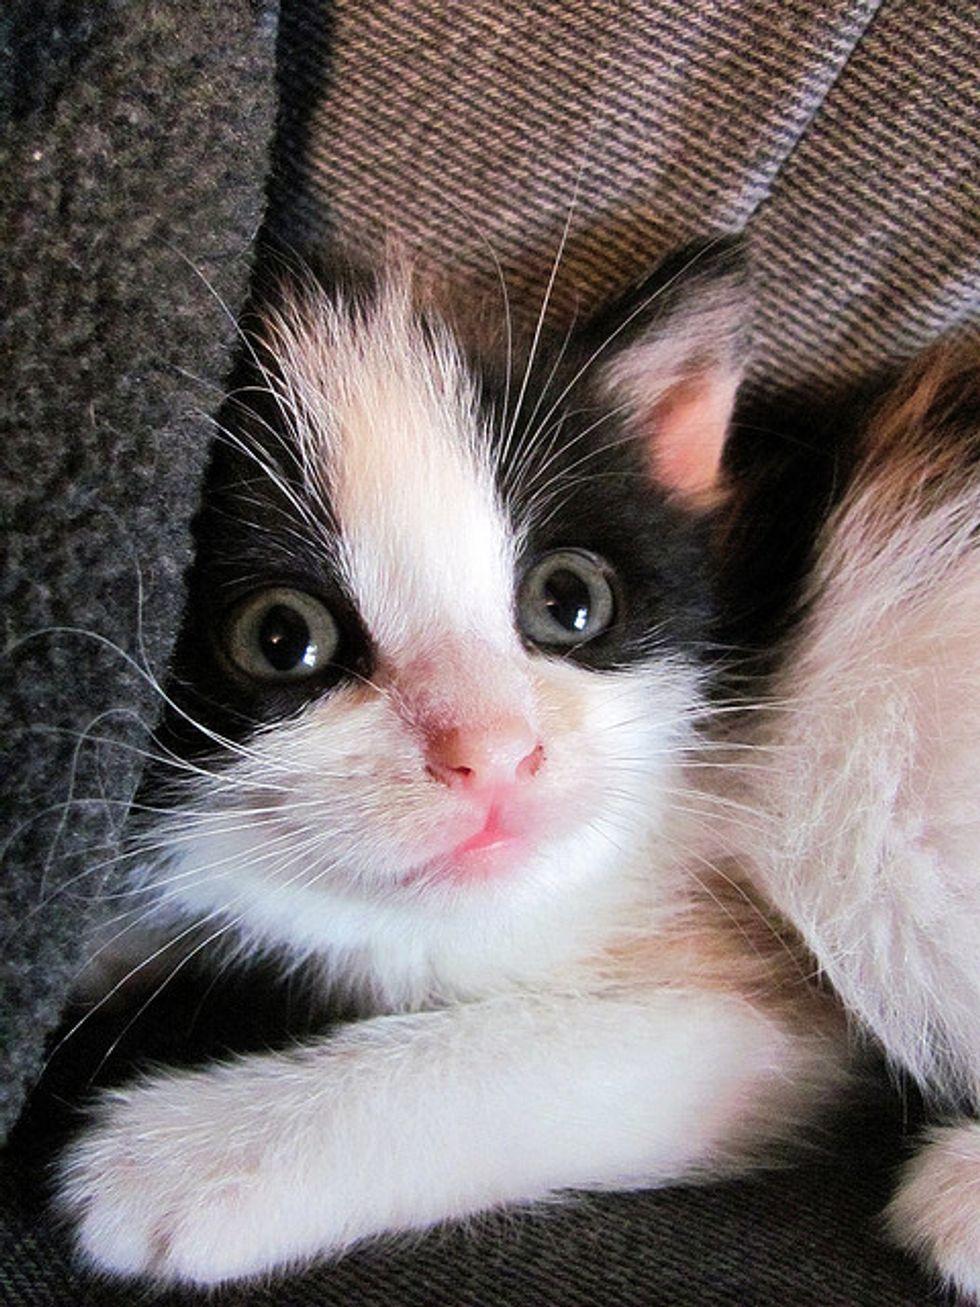 Story of Kiwi the Little Calico Cat